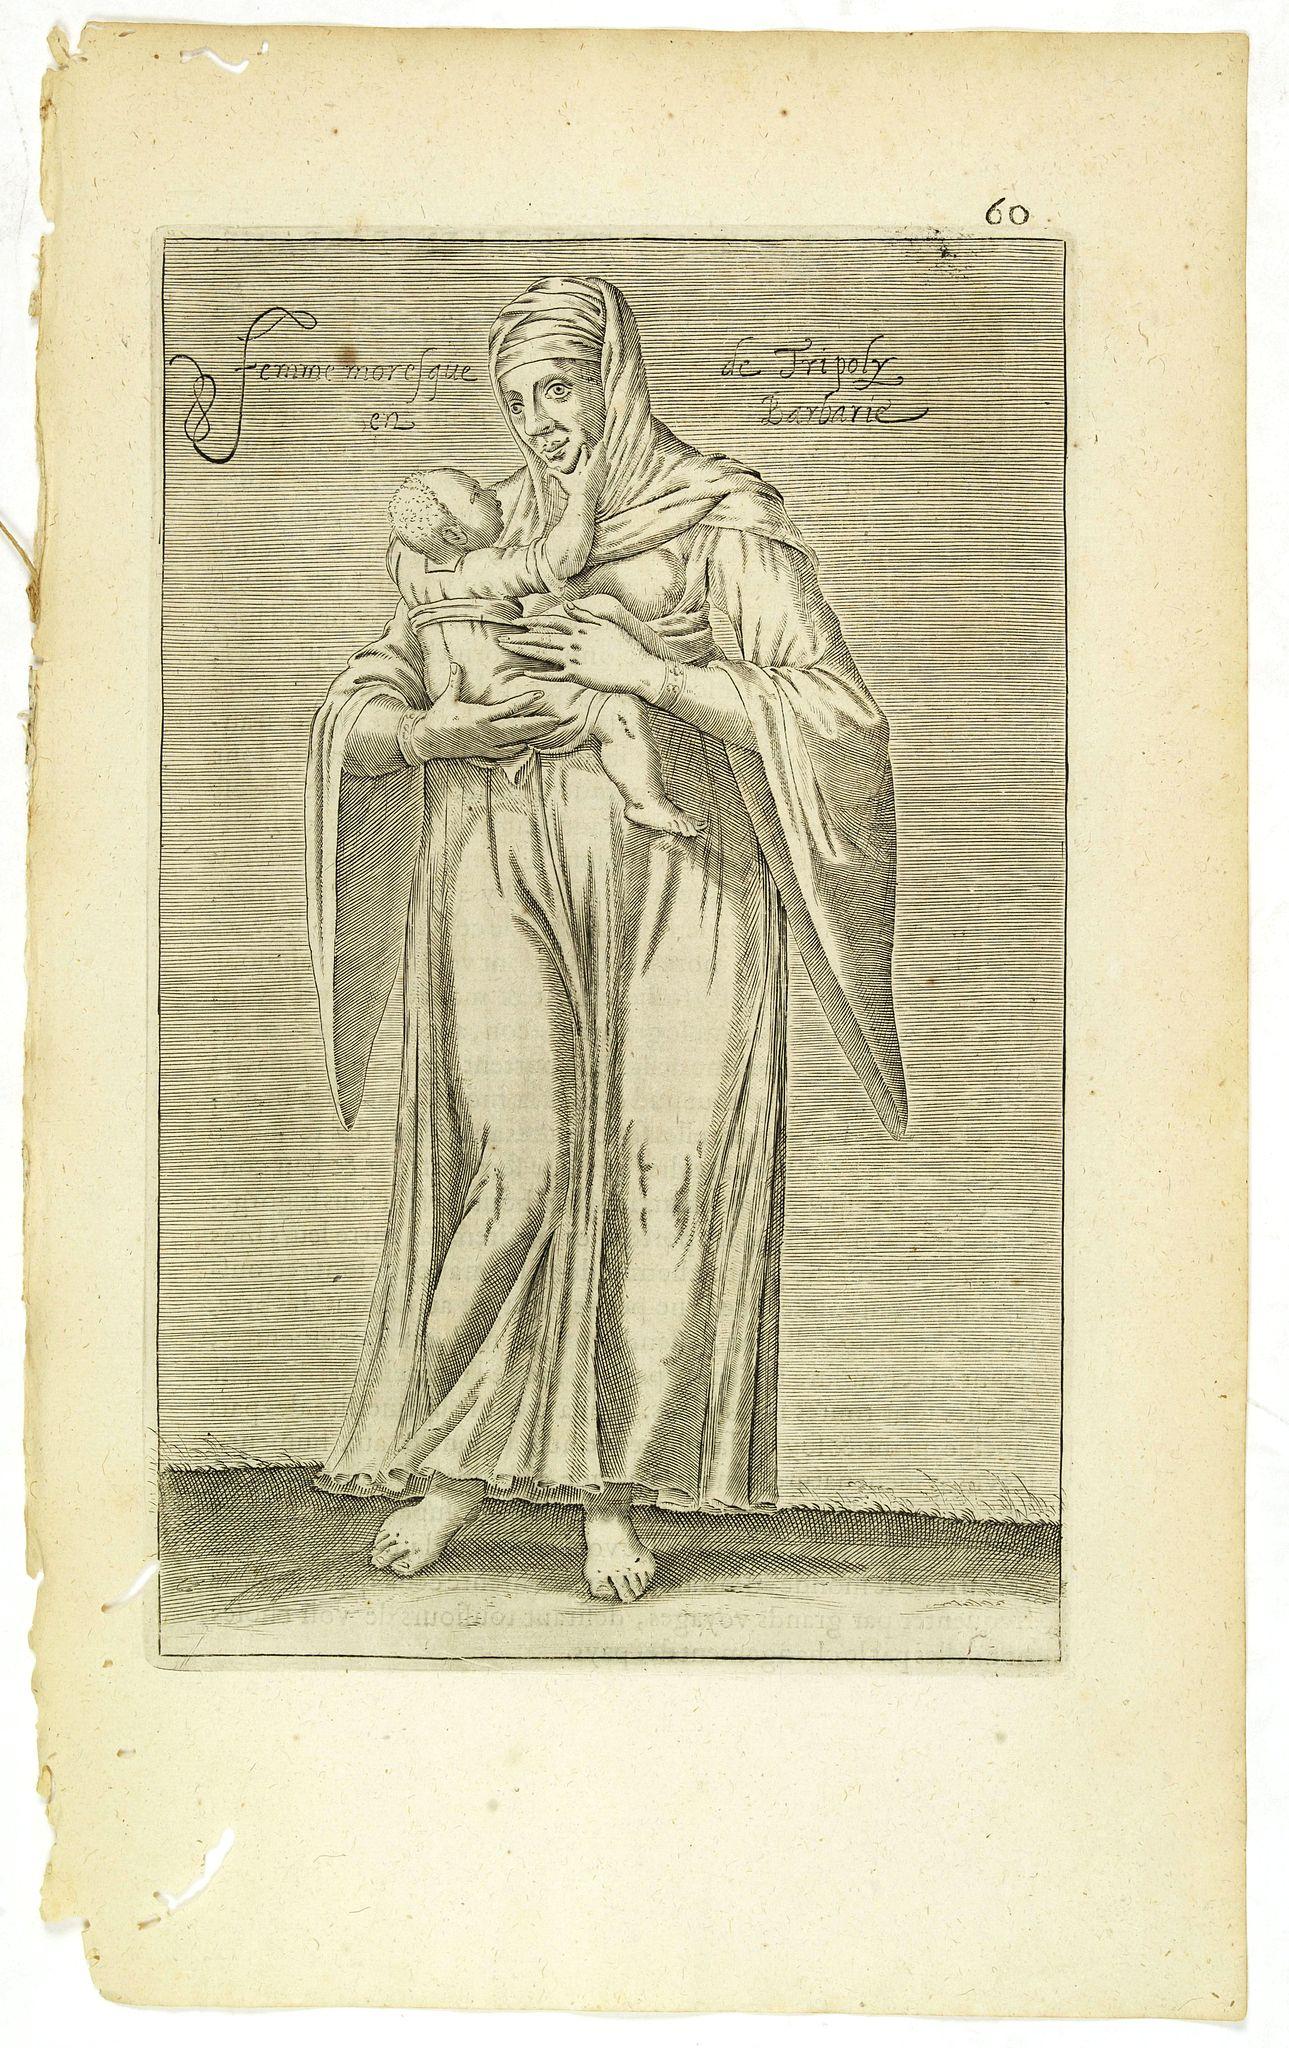 NICOLAS DE NICOLAY, Thomas Artus (sieur d'Embry). -  Femme moresque de Tripoly en Barbarie. (60)